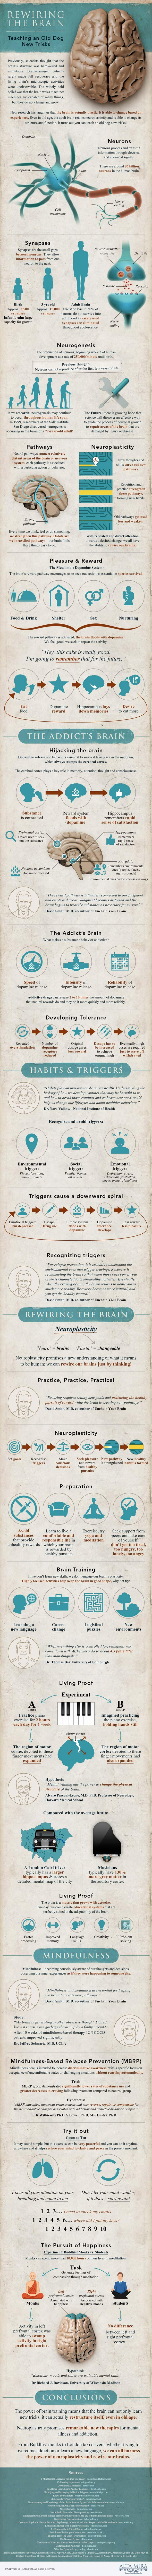 Neuroplasticity Infographic